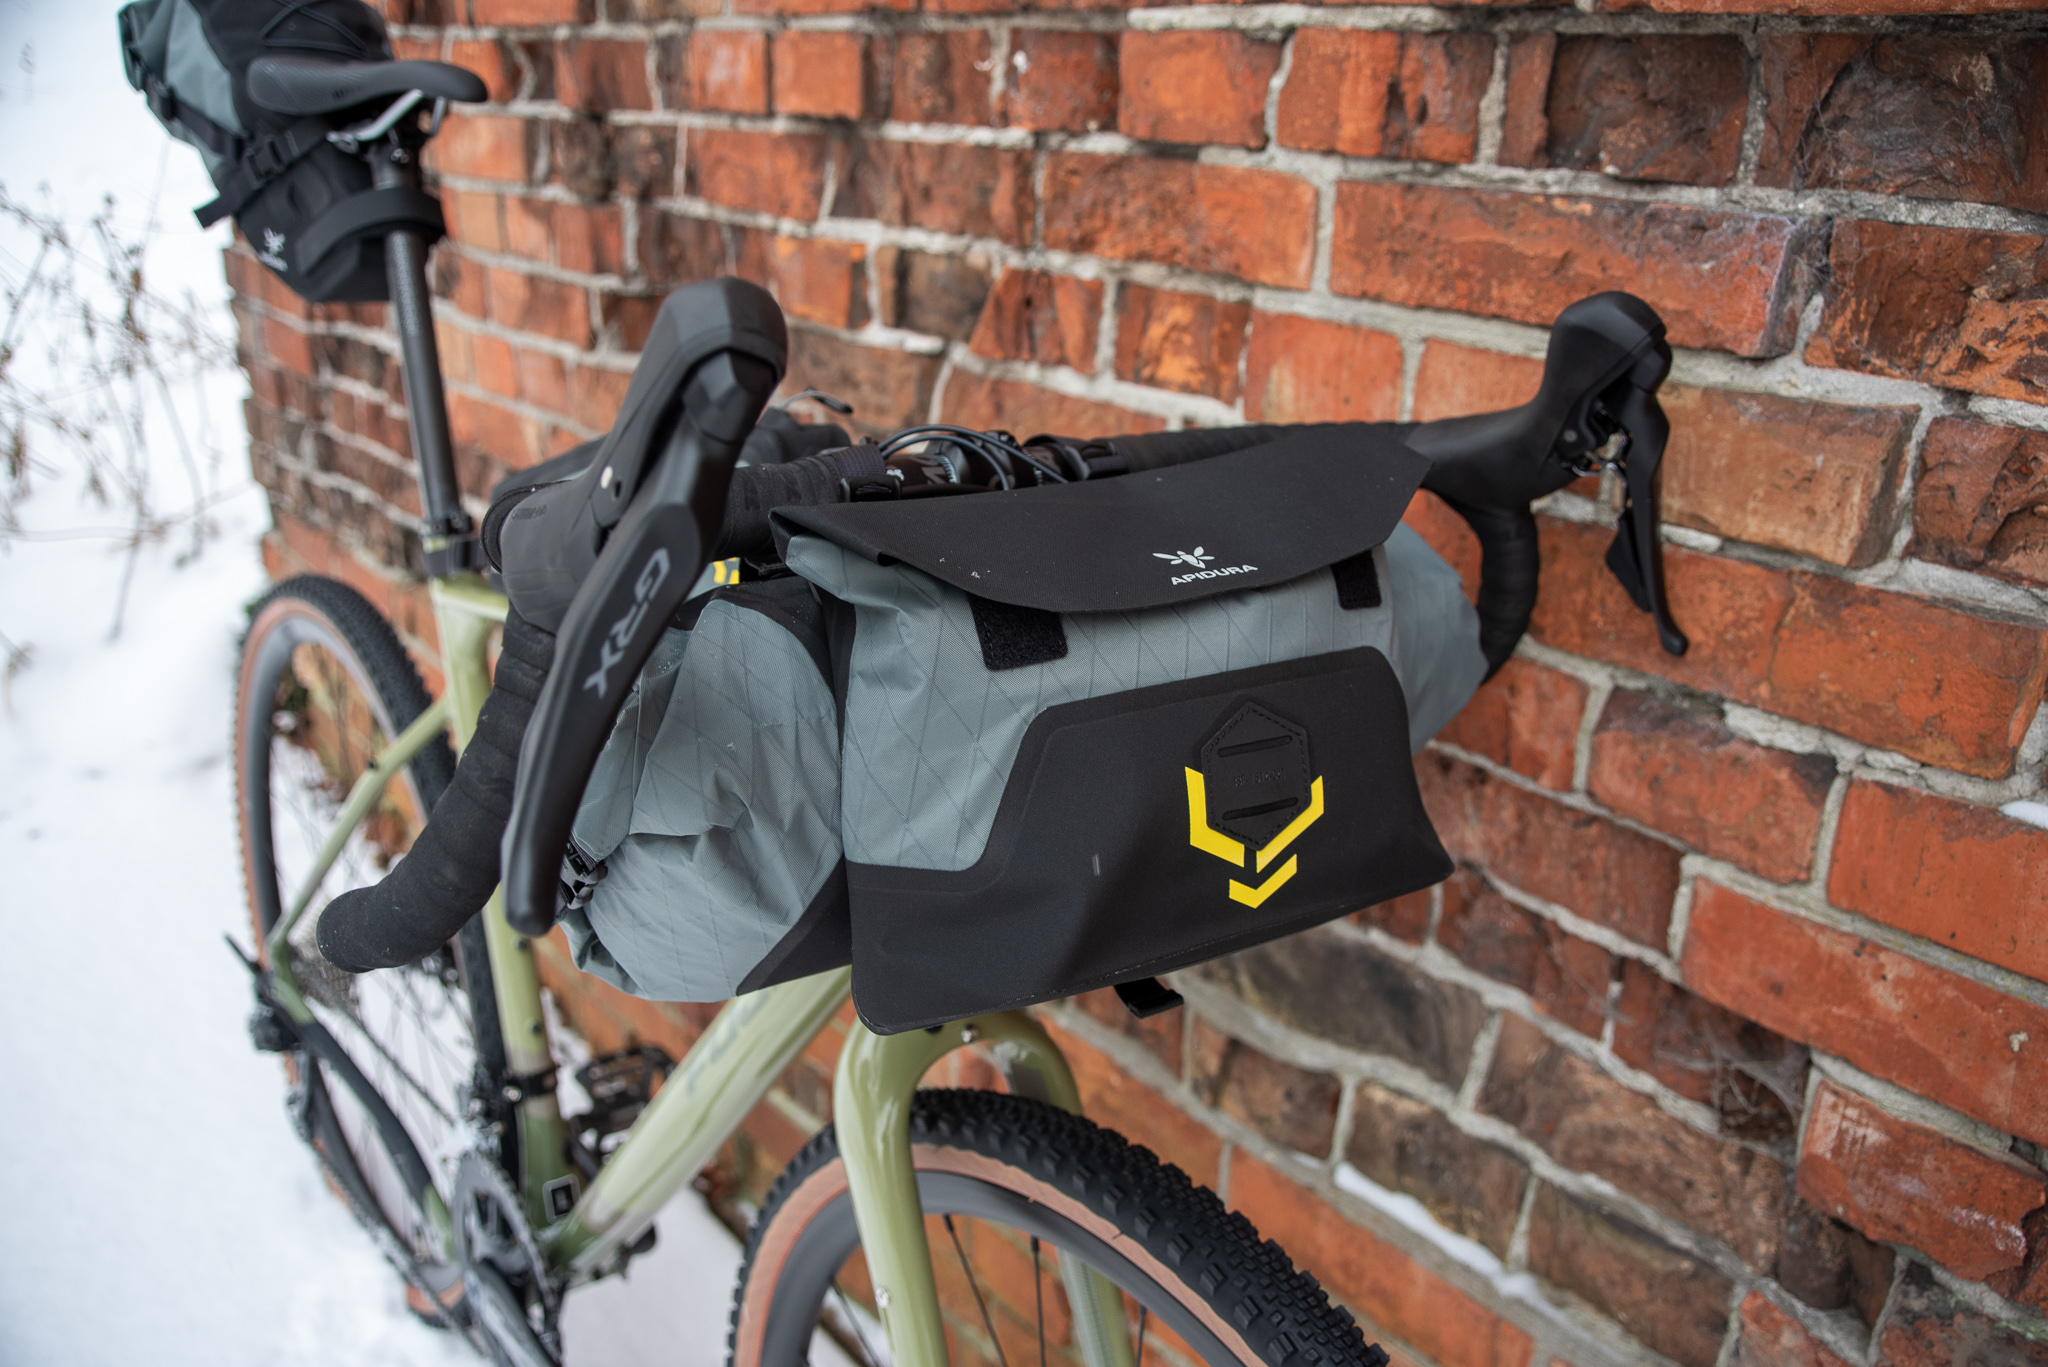 Apidura Backcountry Series 2021 torby do bikepackingu, torby bikepackingowe